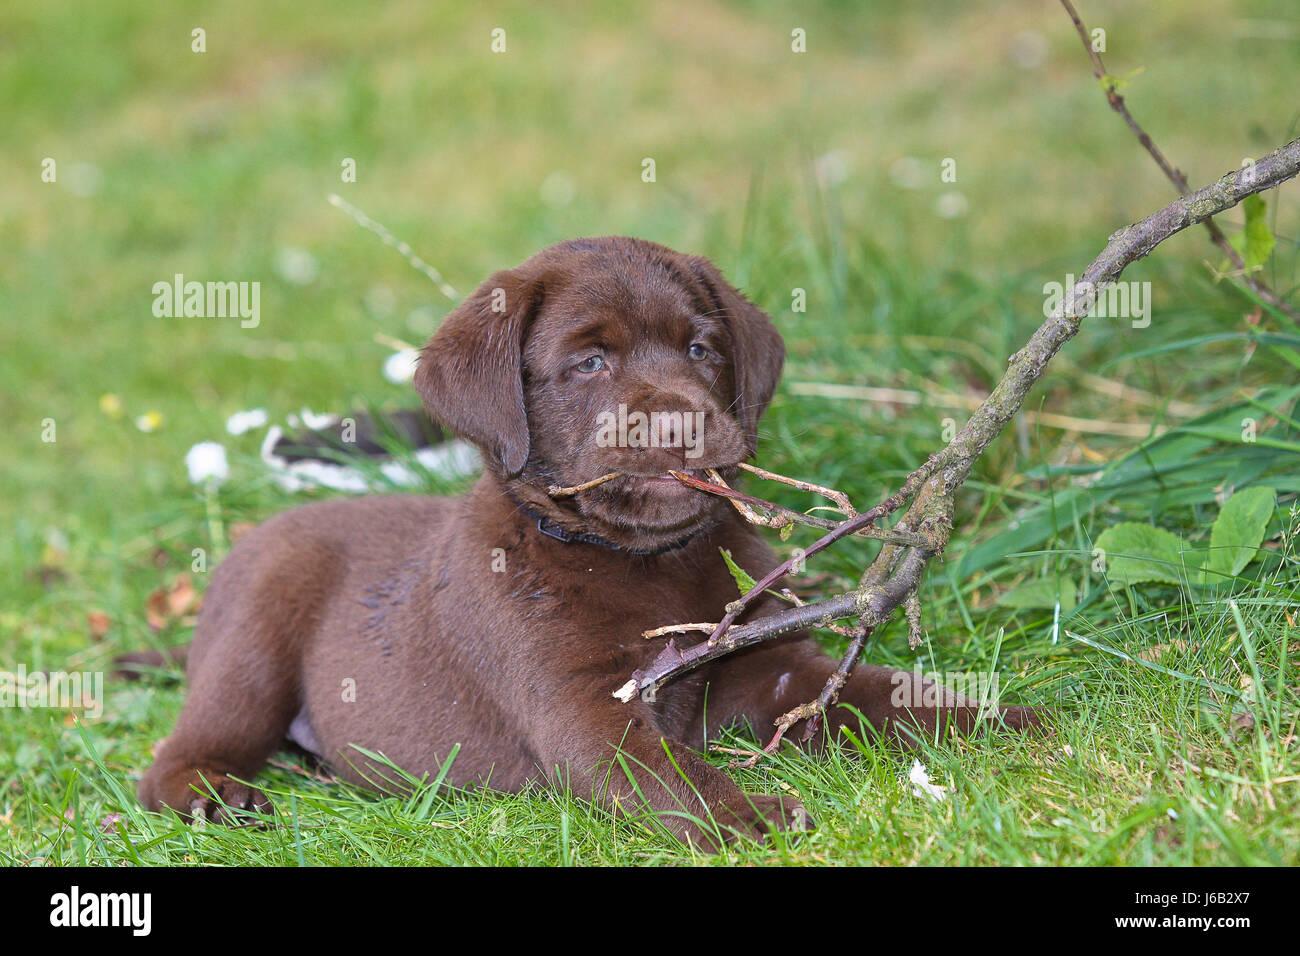 Chocolate Labrador Puppy 6 Weeks Old Stock Photo Alamy